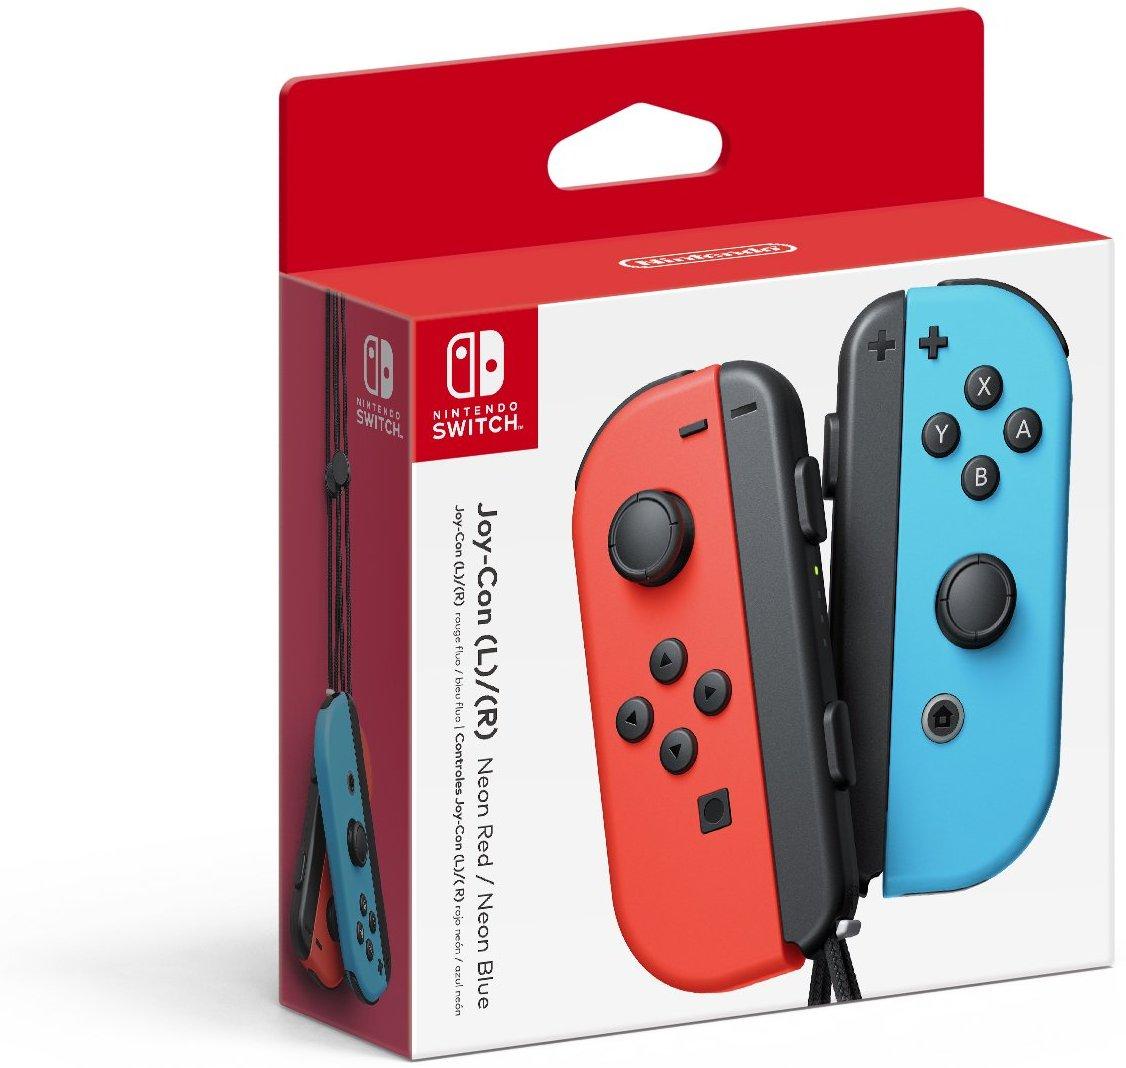 Nintendo Switch - Joy-Con (L/R)-Neon Red/Neon Blue $64.59 - Amazon